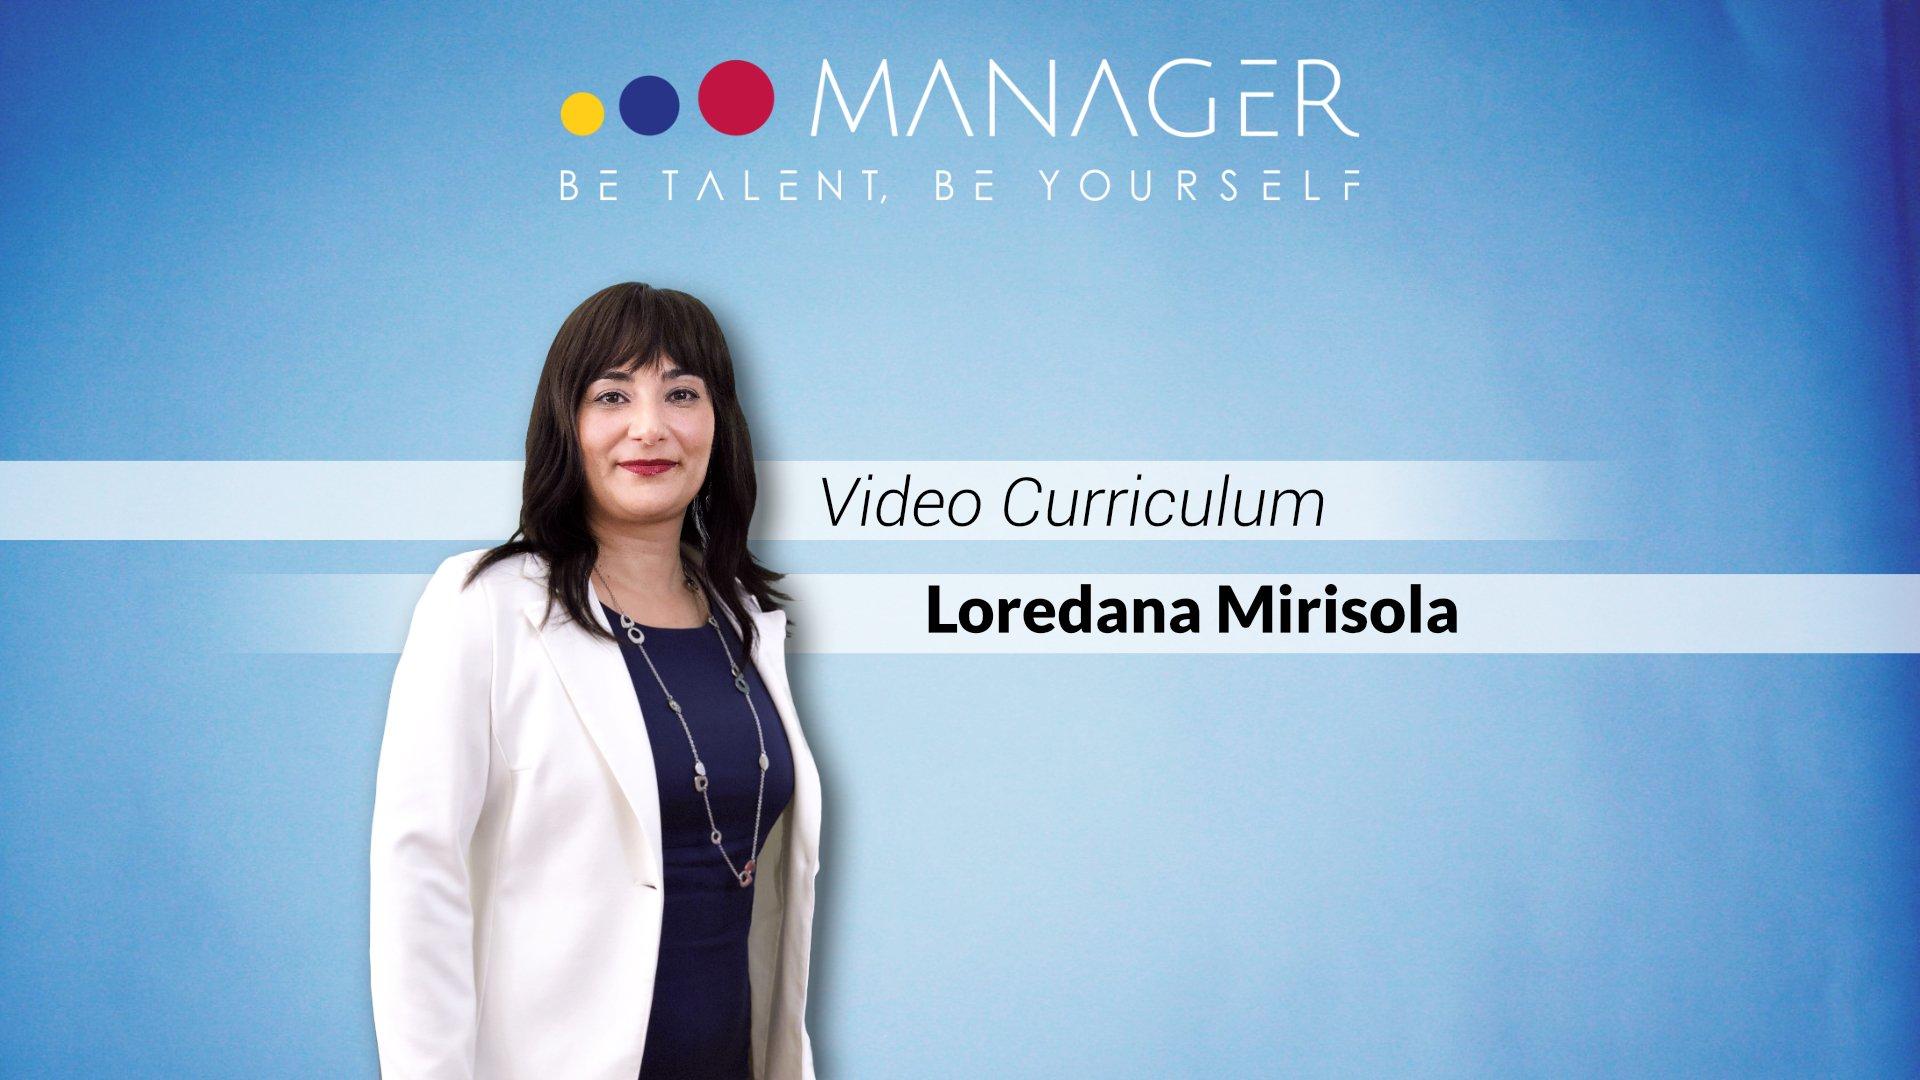 Loredana Mirisola